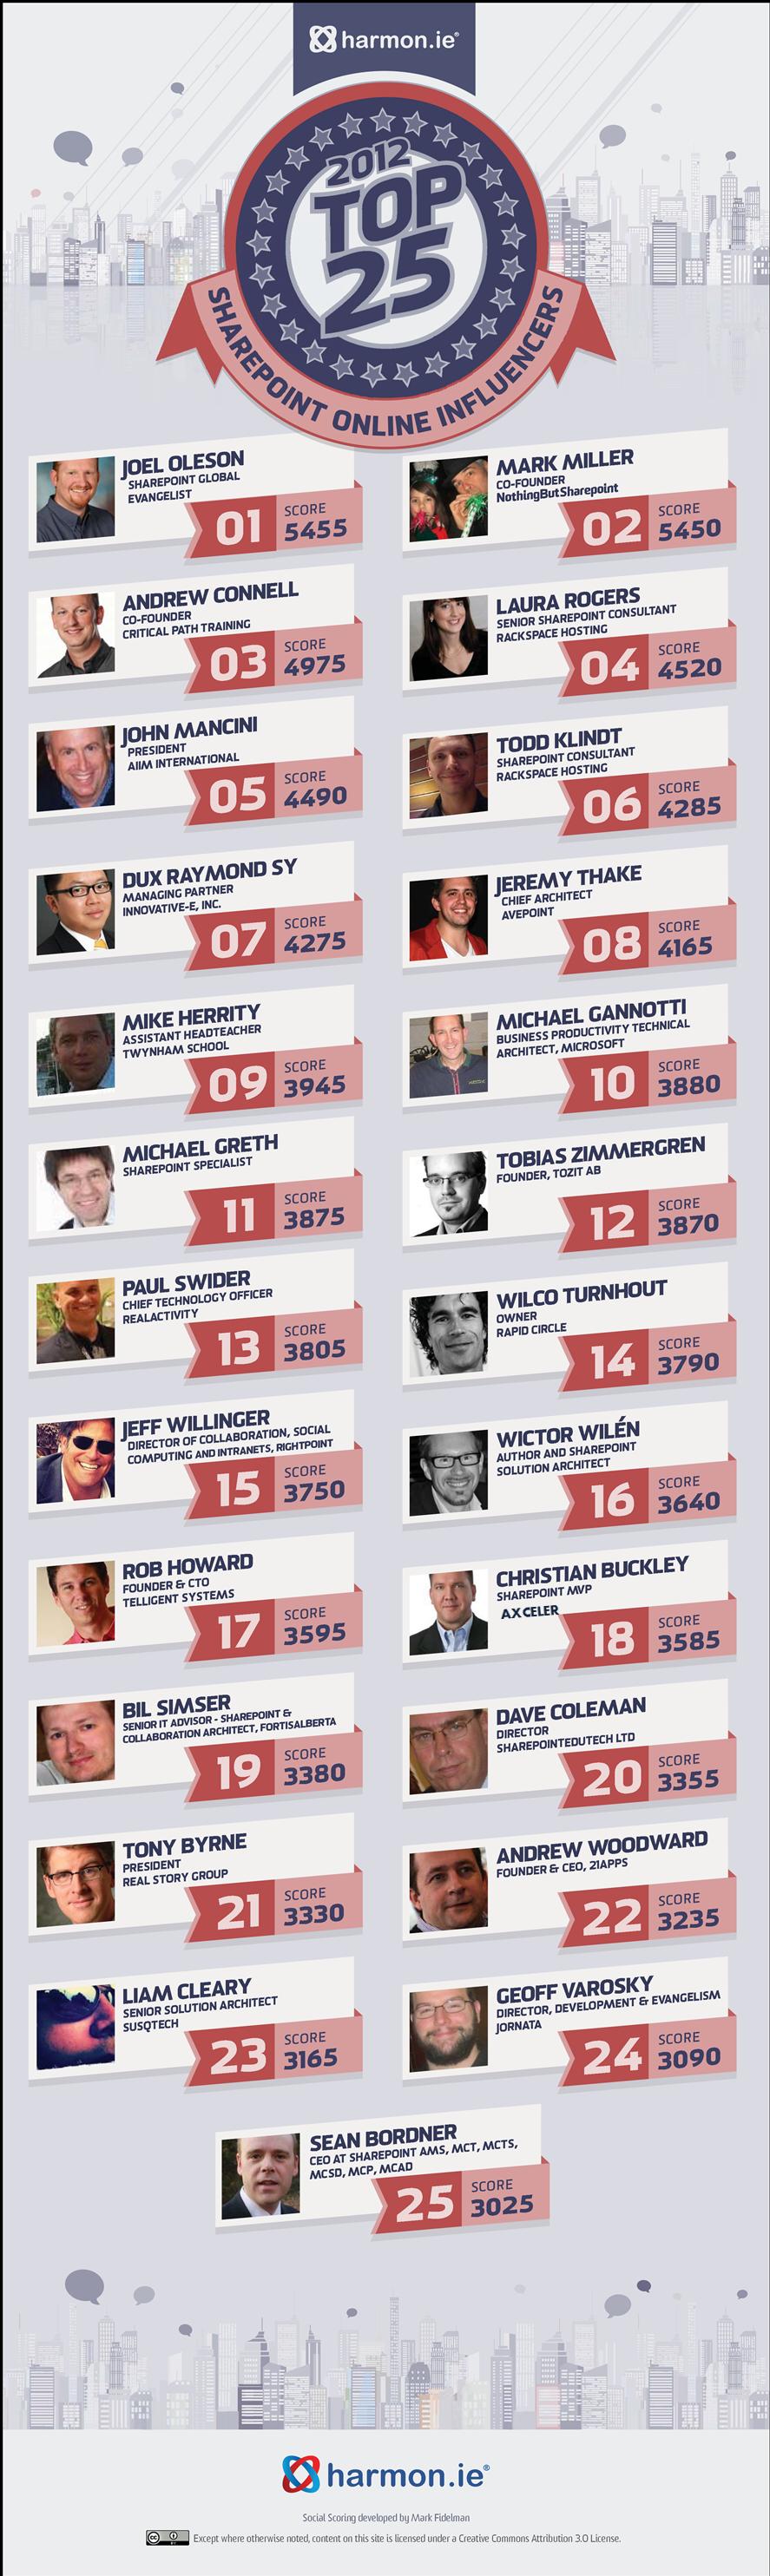 harmon.ie top 25 influencers 2012